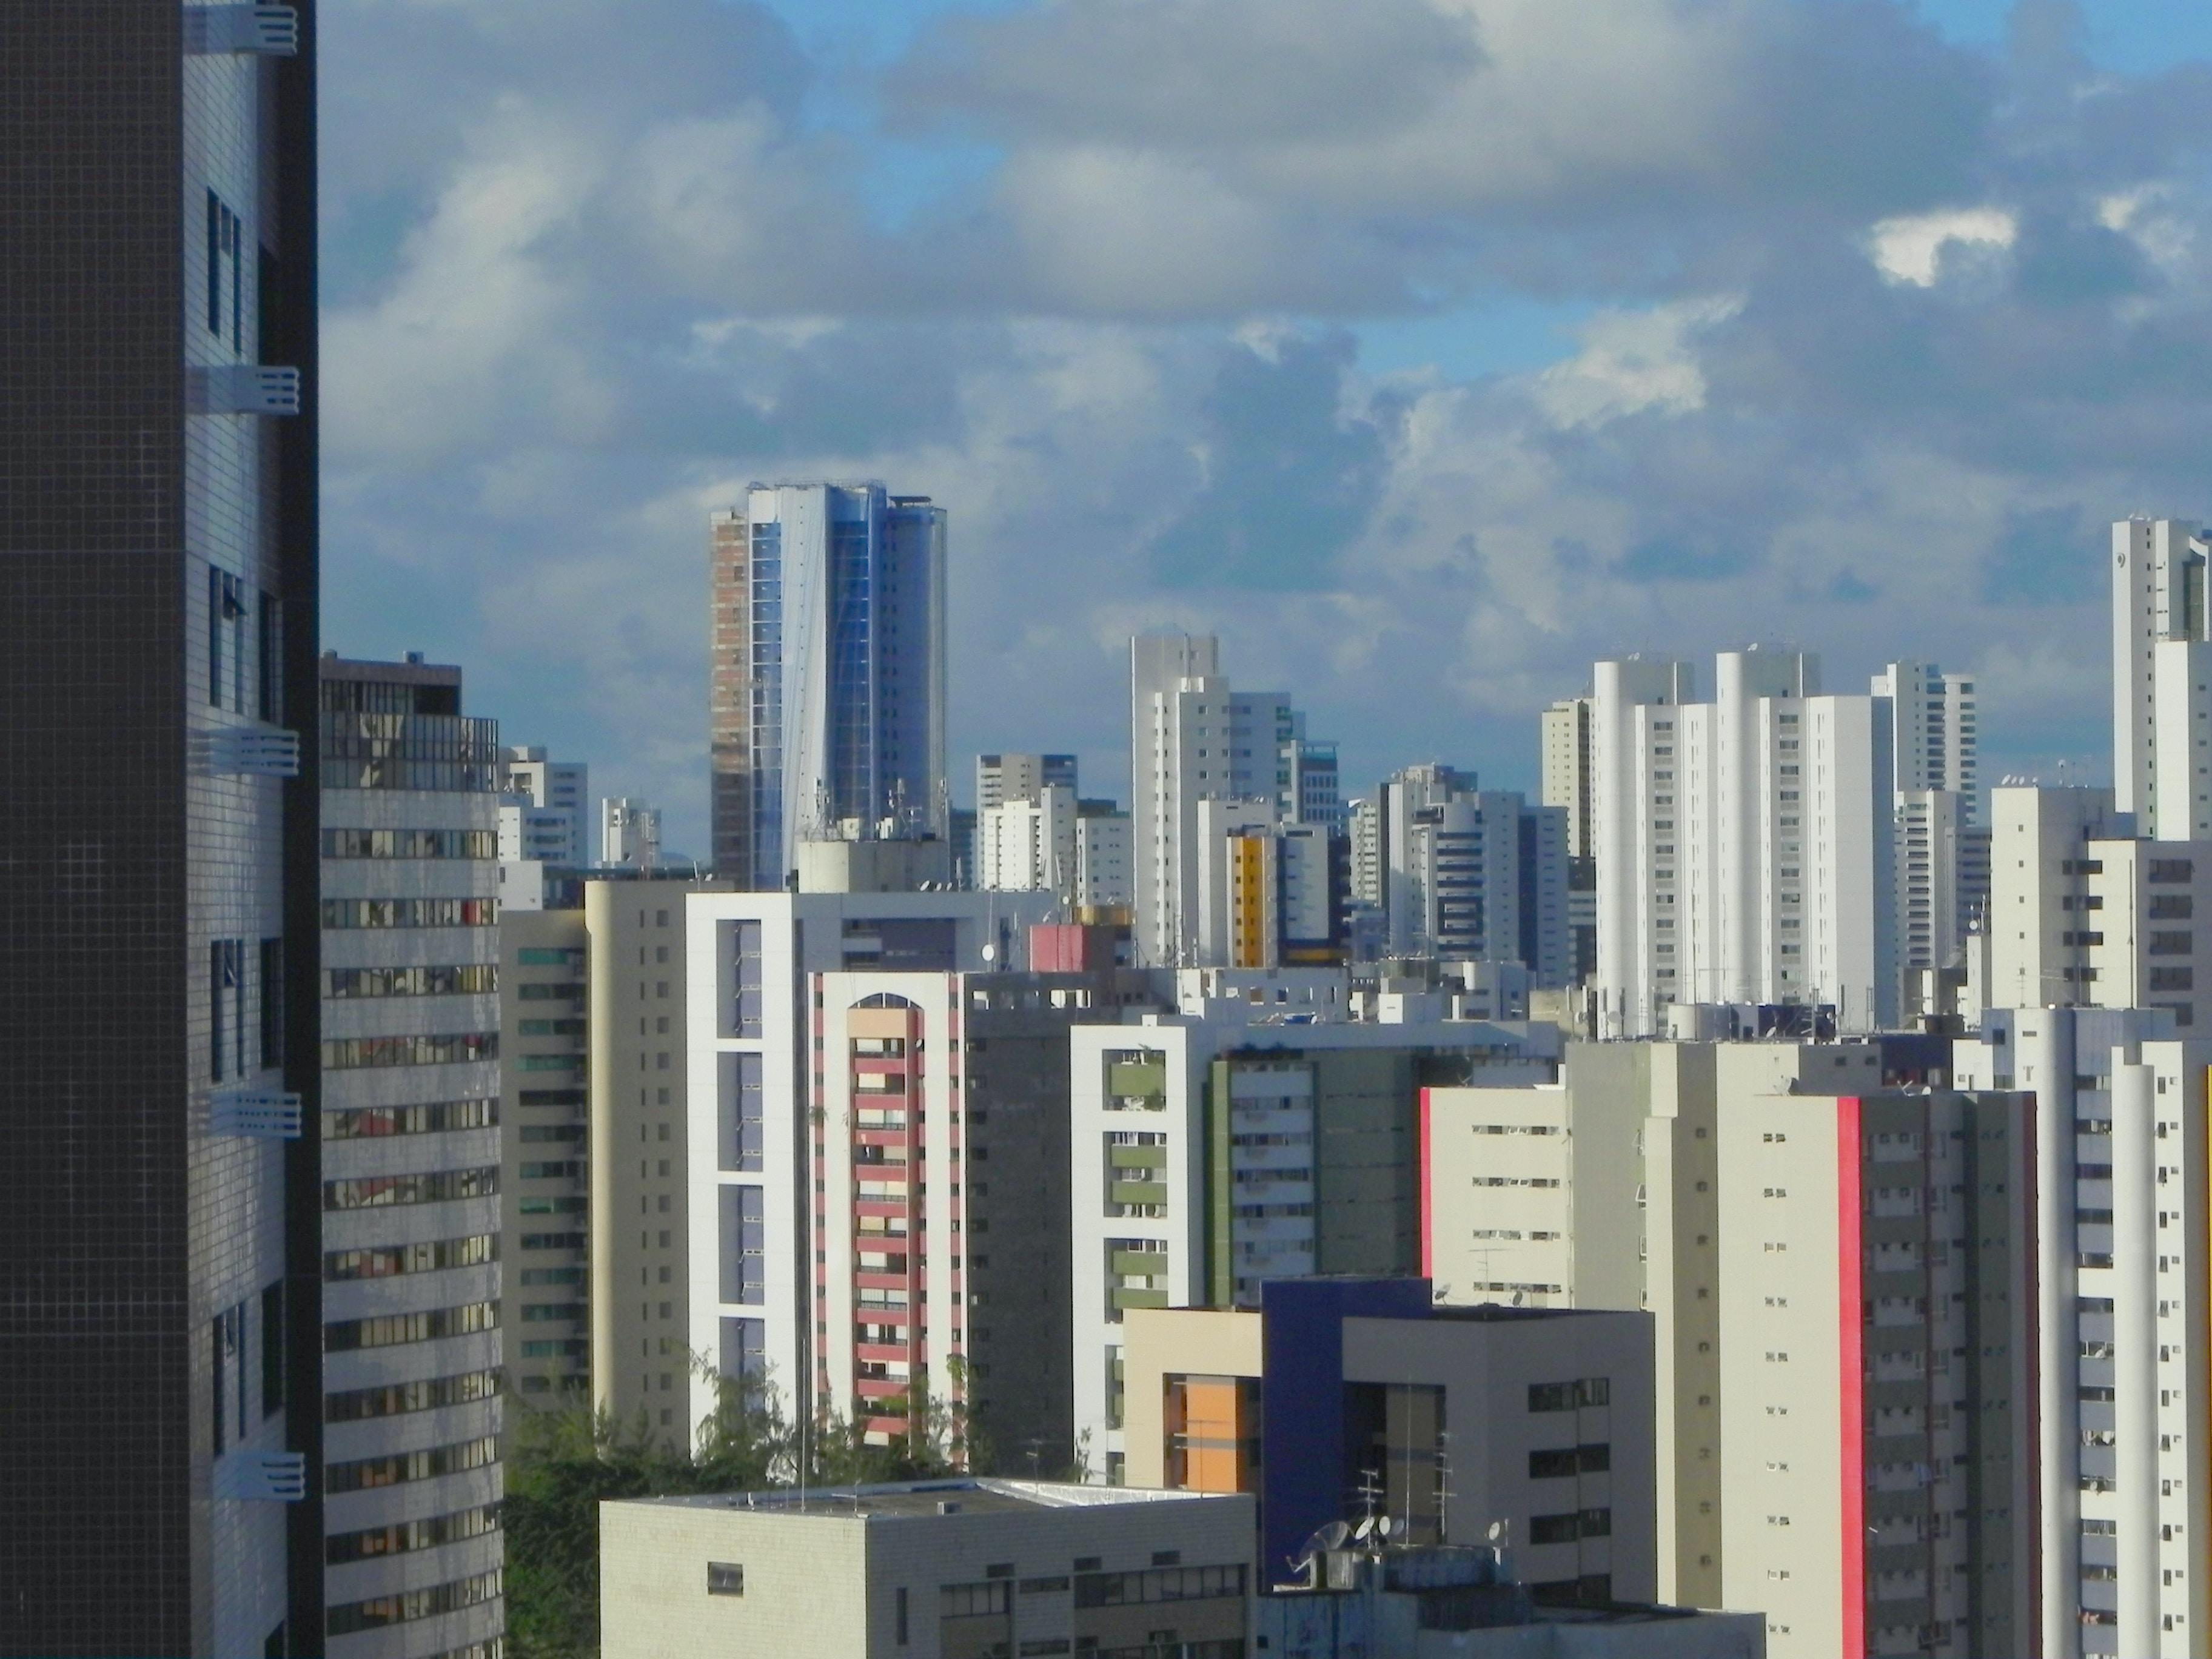 Free Unsplash photo from Antunes Vila Nova Neto